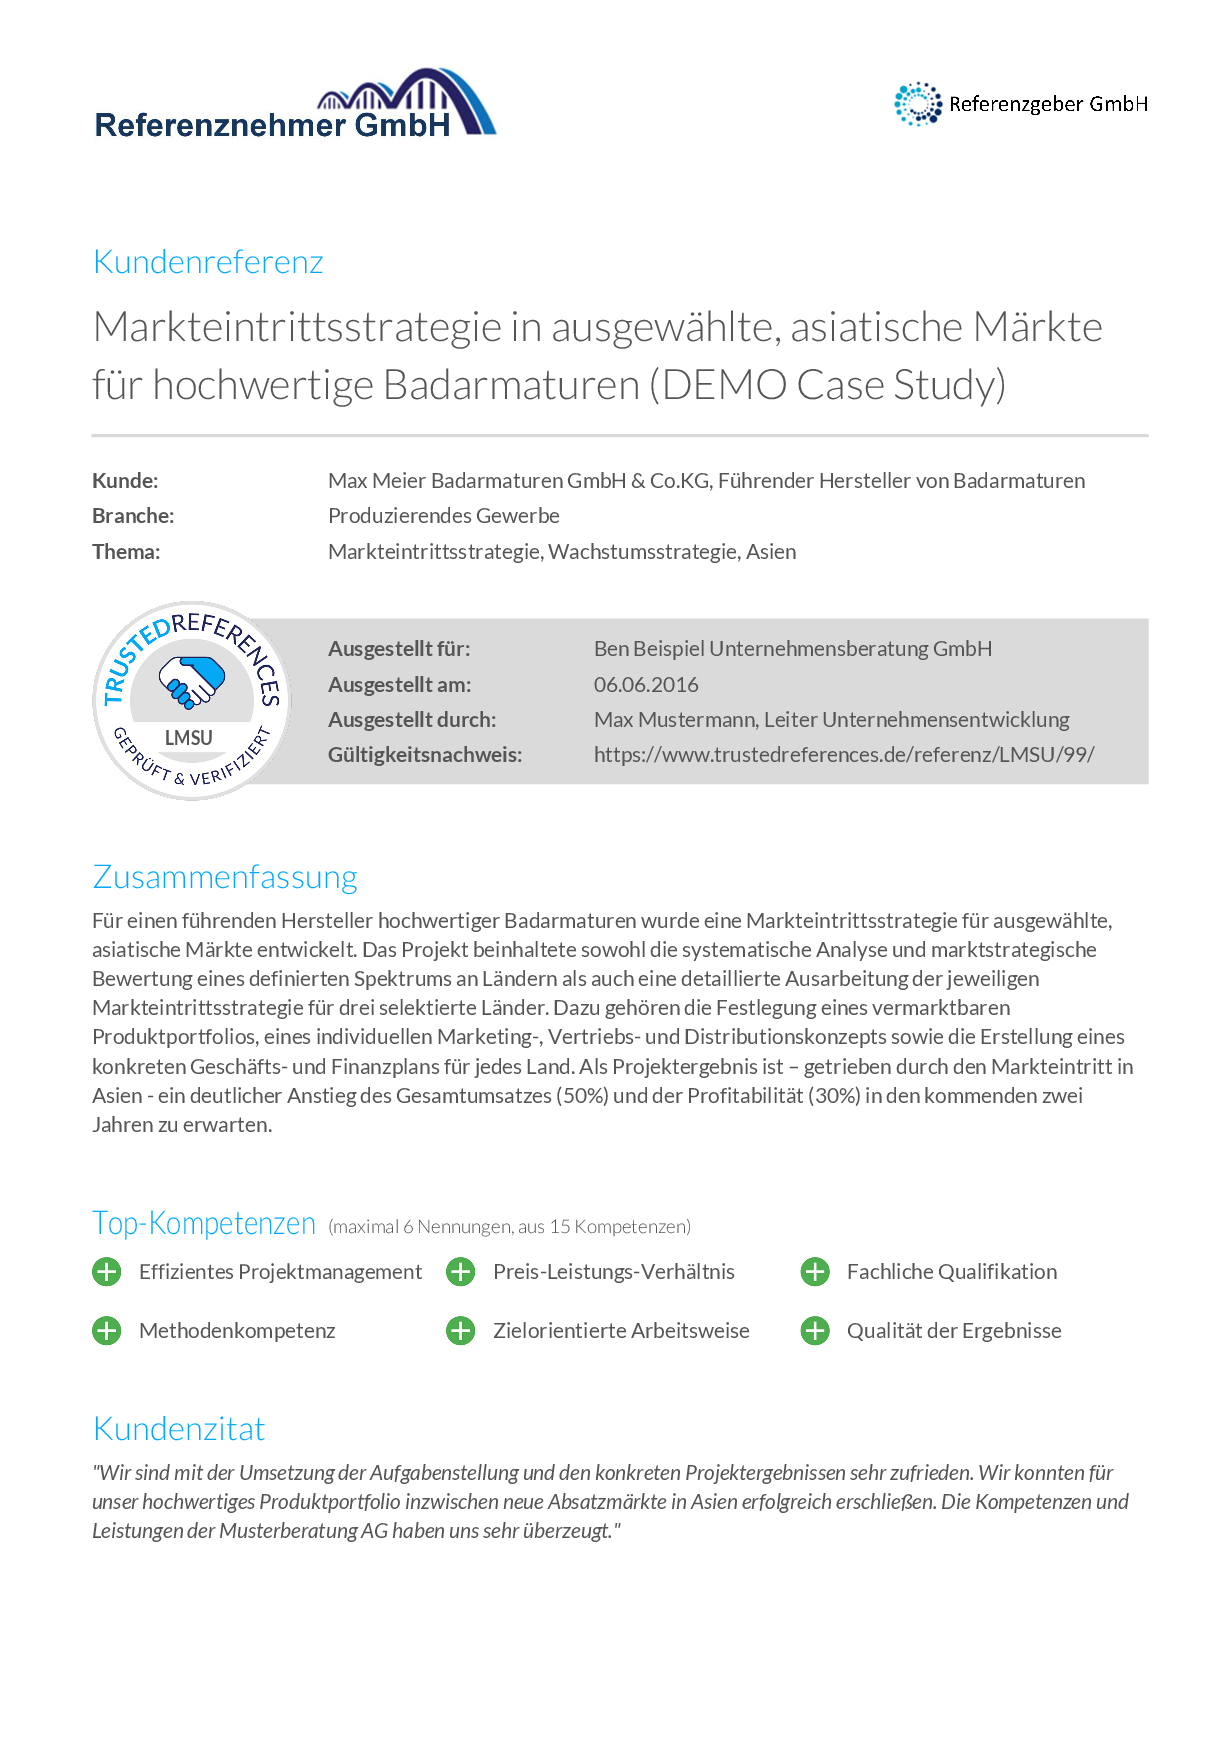 4 Case Study_B2B_Content_Marketing_Referenzmarketing_Trusted_References 1